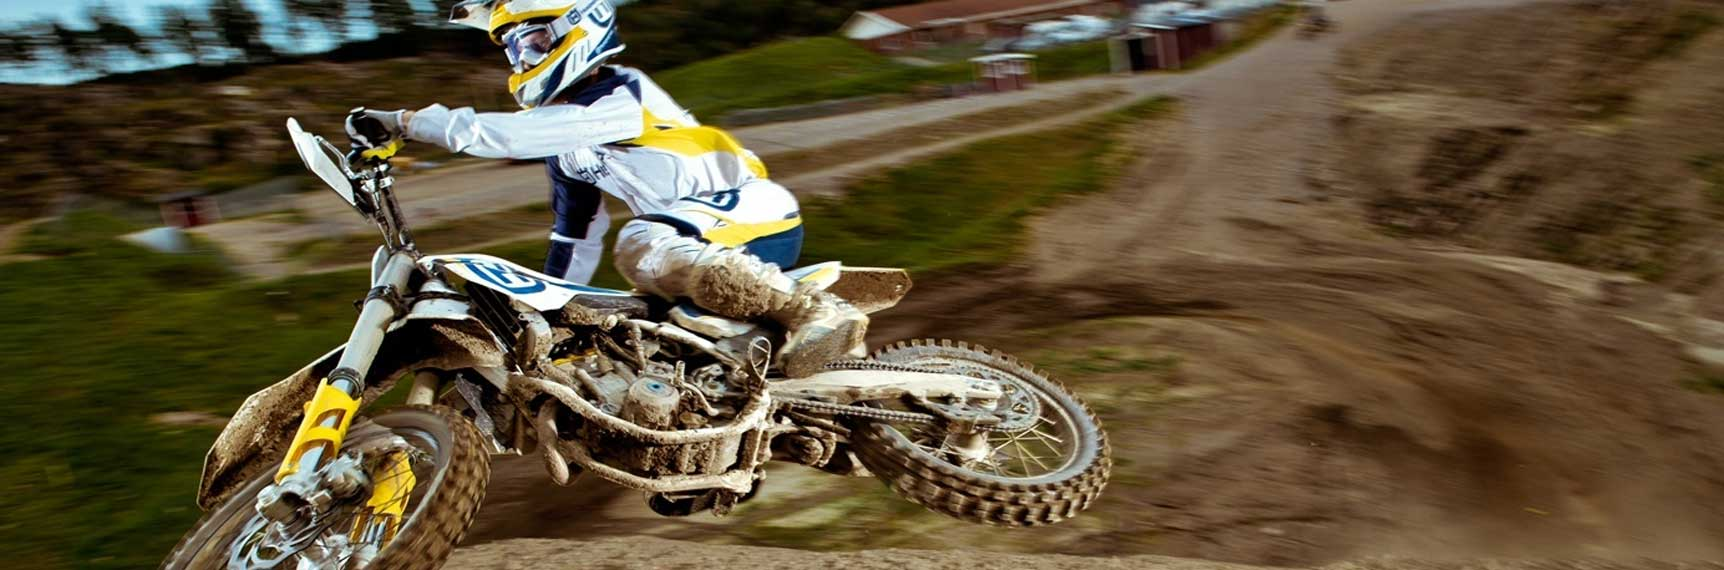 St Blazey MX - Husqvarna, Honda, Suzuki Motocross Bikes